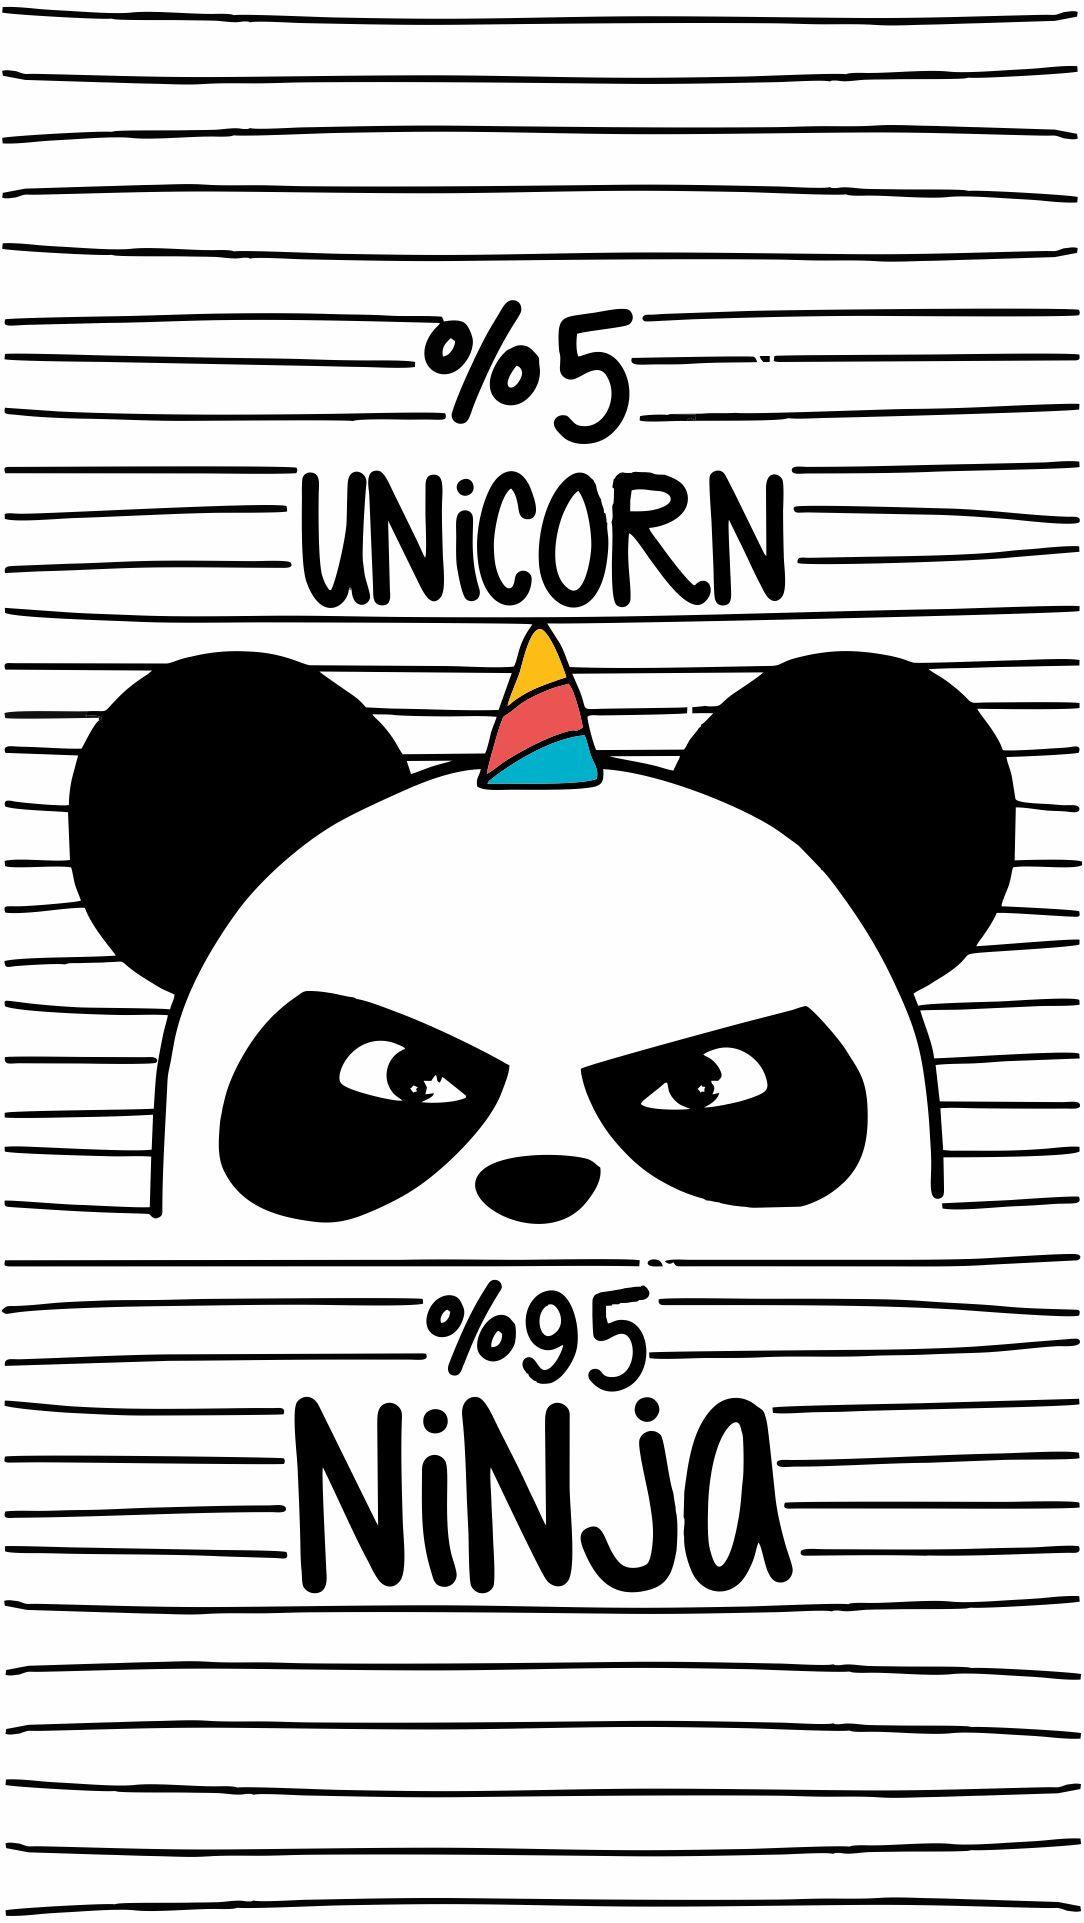 Wallpaper iphone unicorn tumblr - Panda Unicorn Total 100 Adrenalina